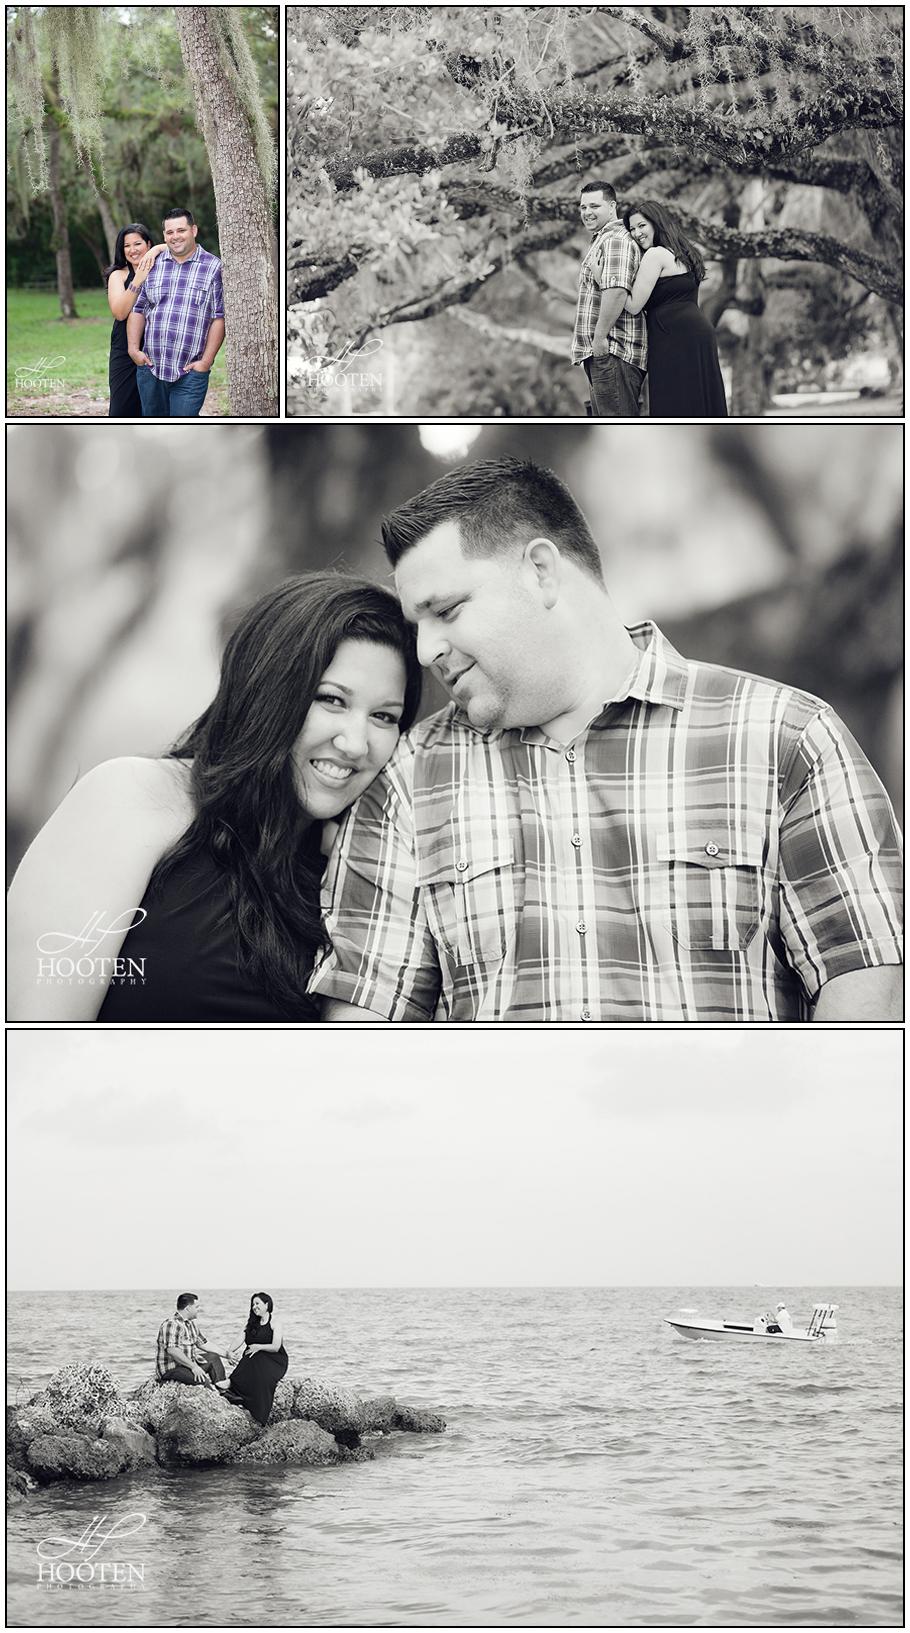 South-Florida-Engagement-Photography-Iris-Cory.jpg